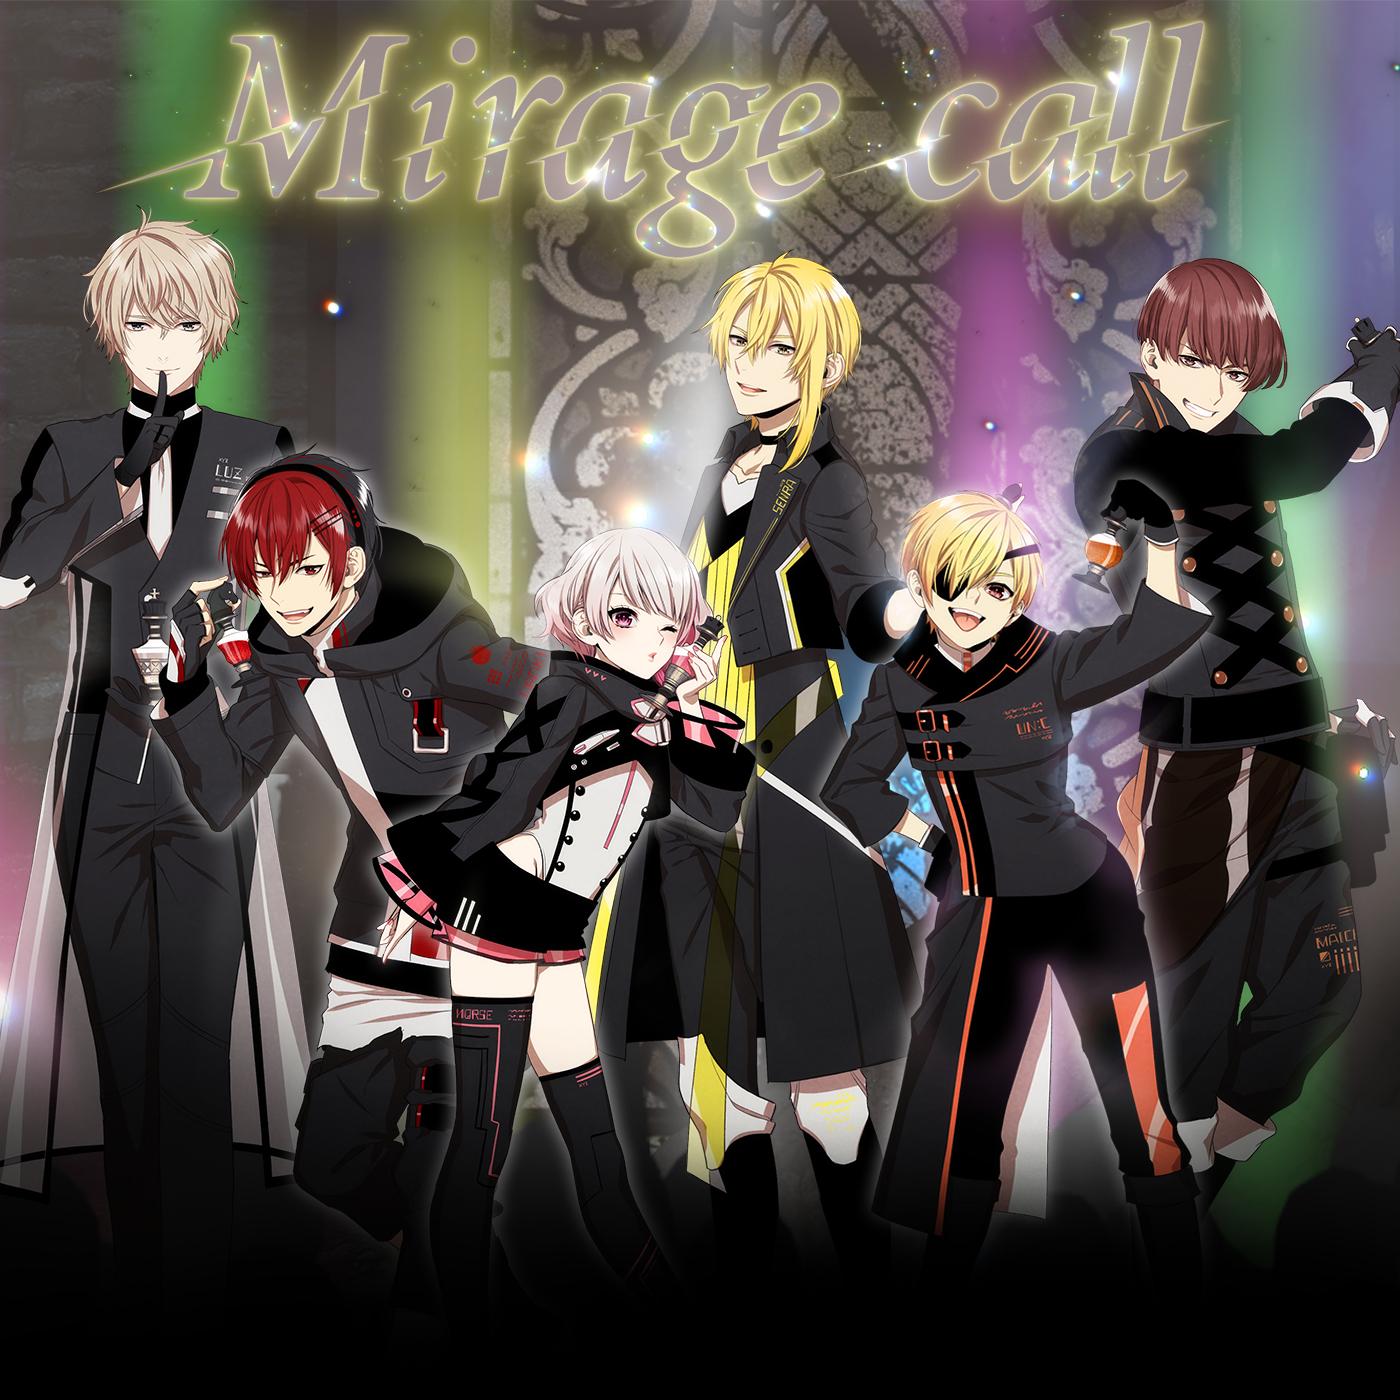 「Mirage call」